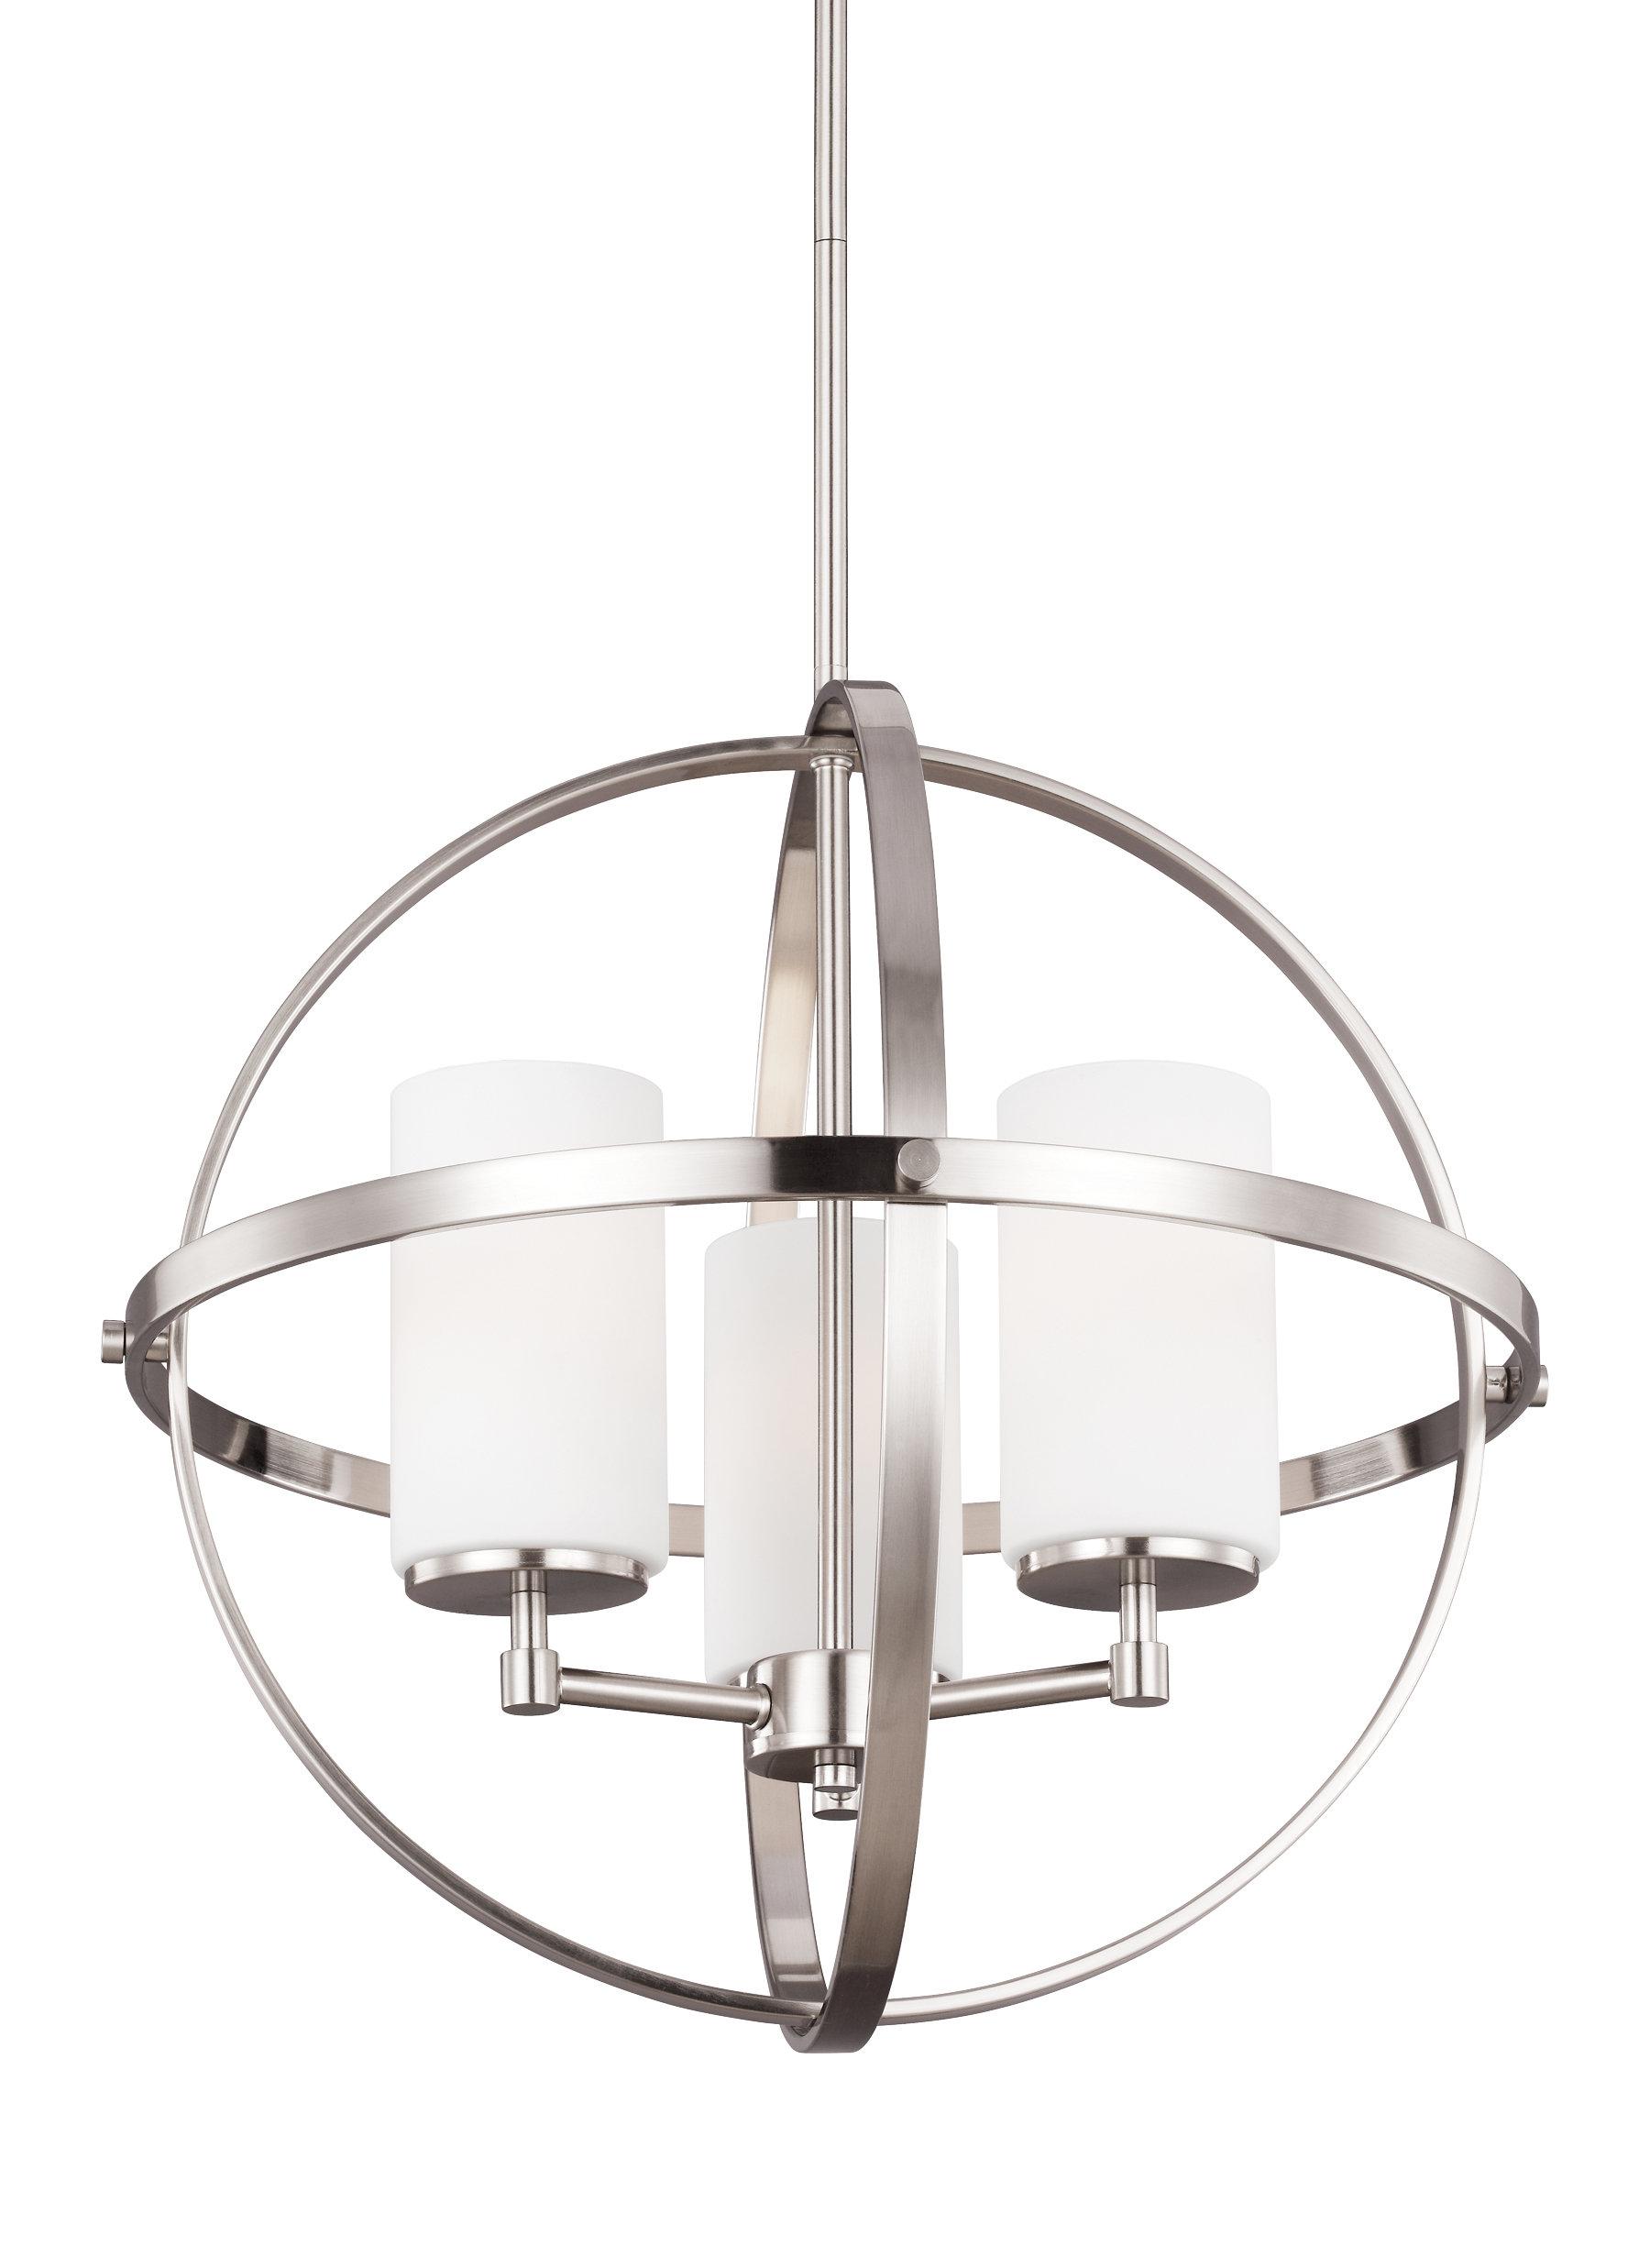 Raine 3 Light Globe Chandelier Regarding La Sarre 3 Light Globe Chandeliers (View 9 of 30)